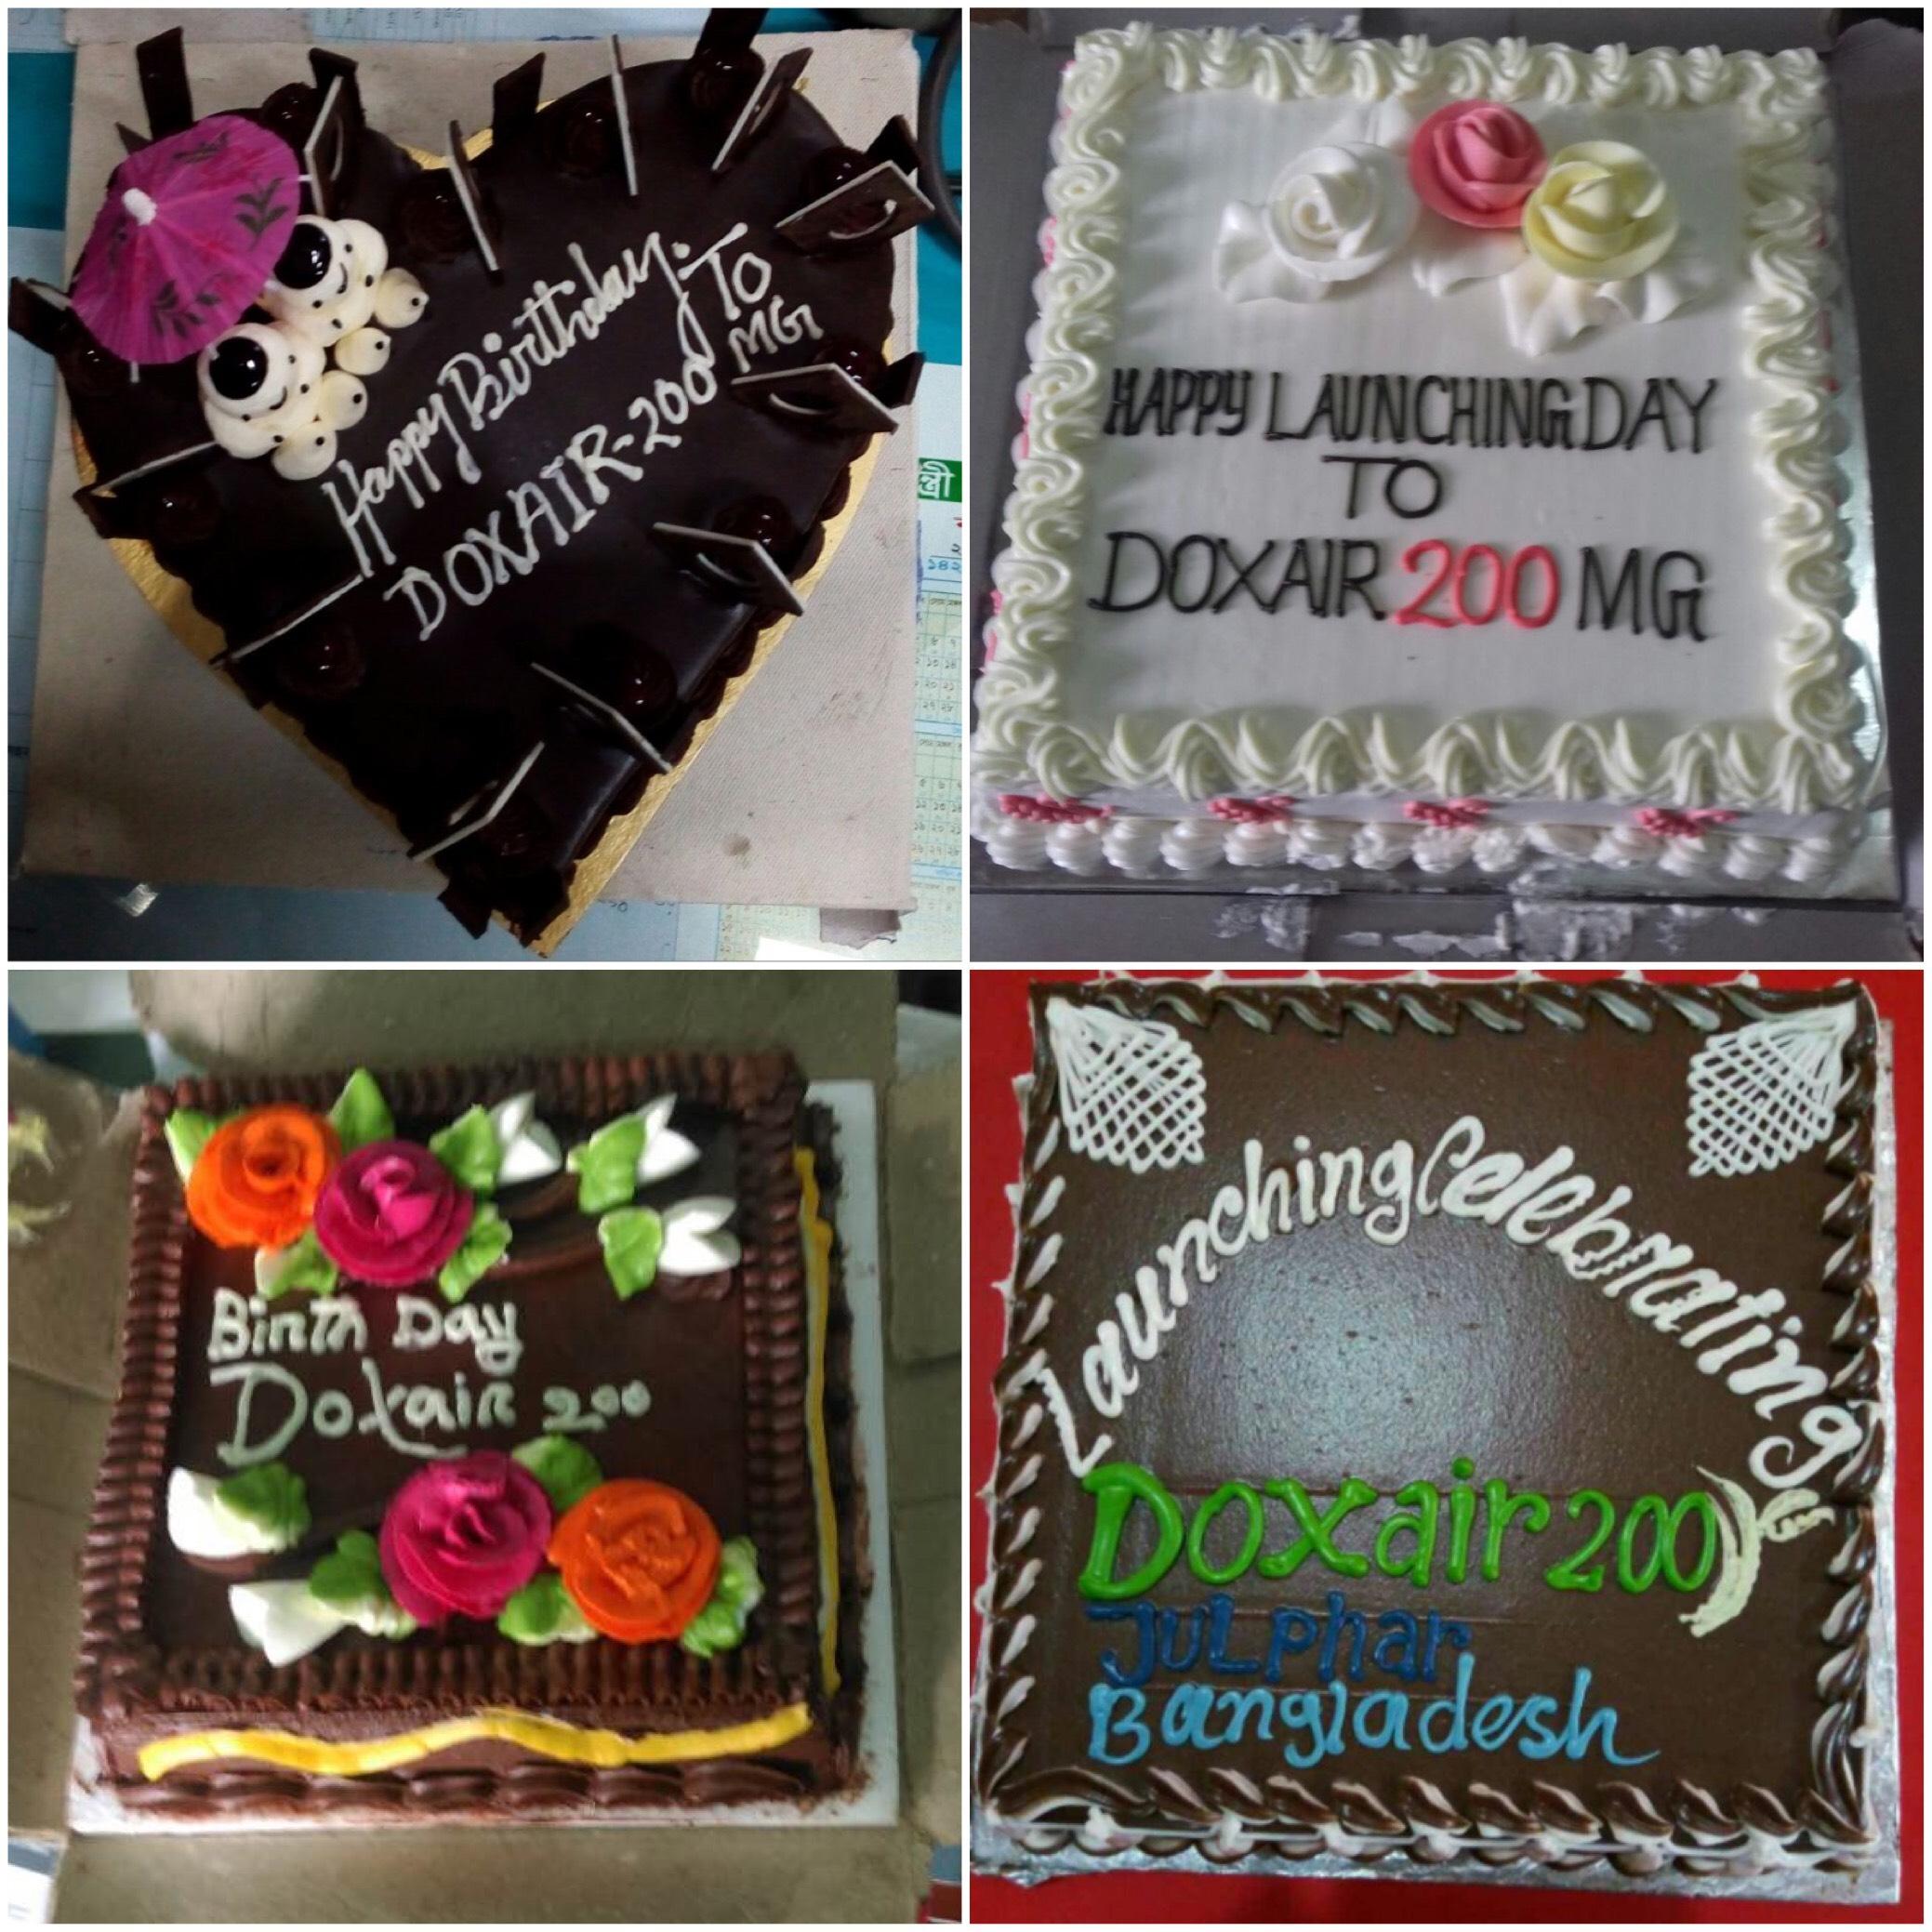 Julphar Bangladesh celebrates Doxair 200 launching program